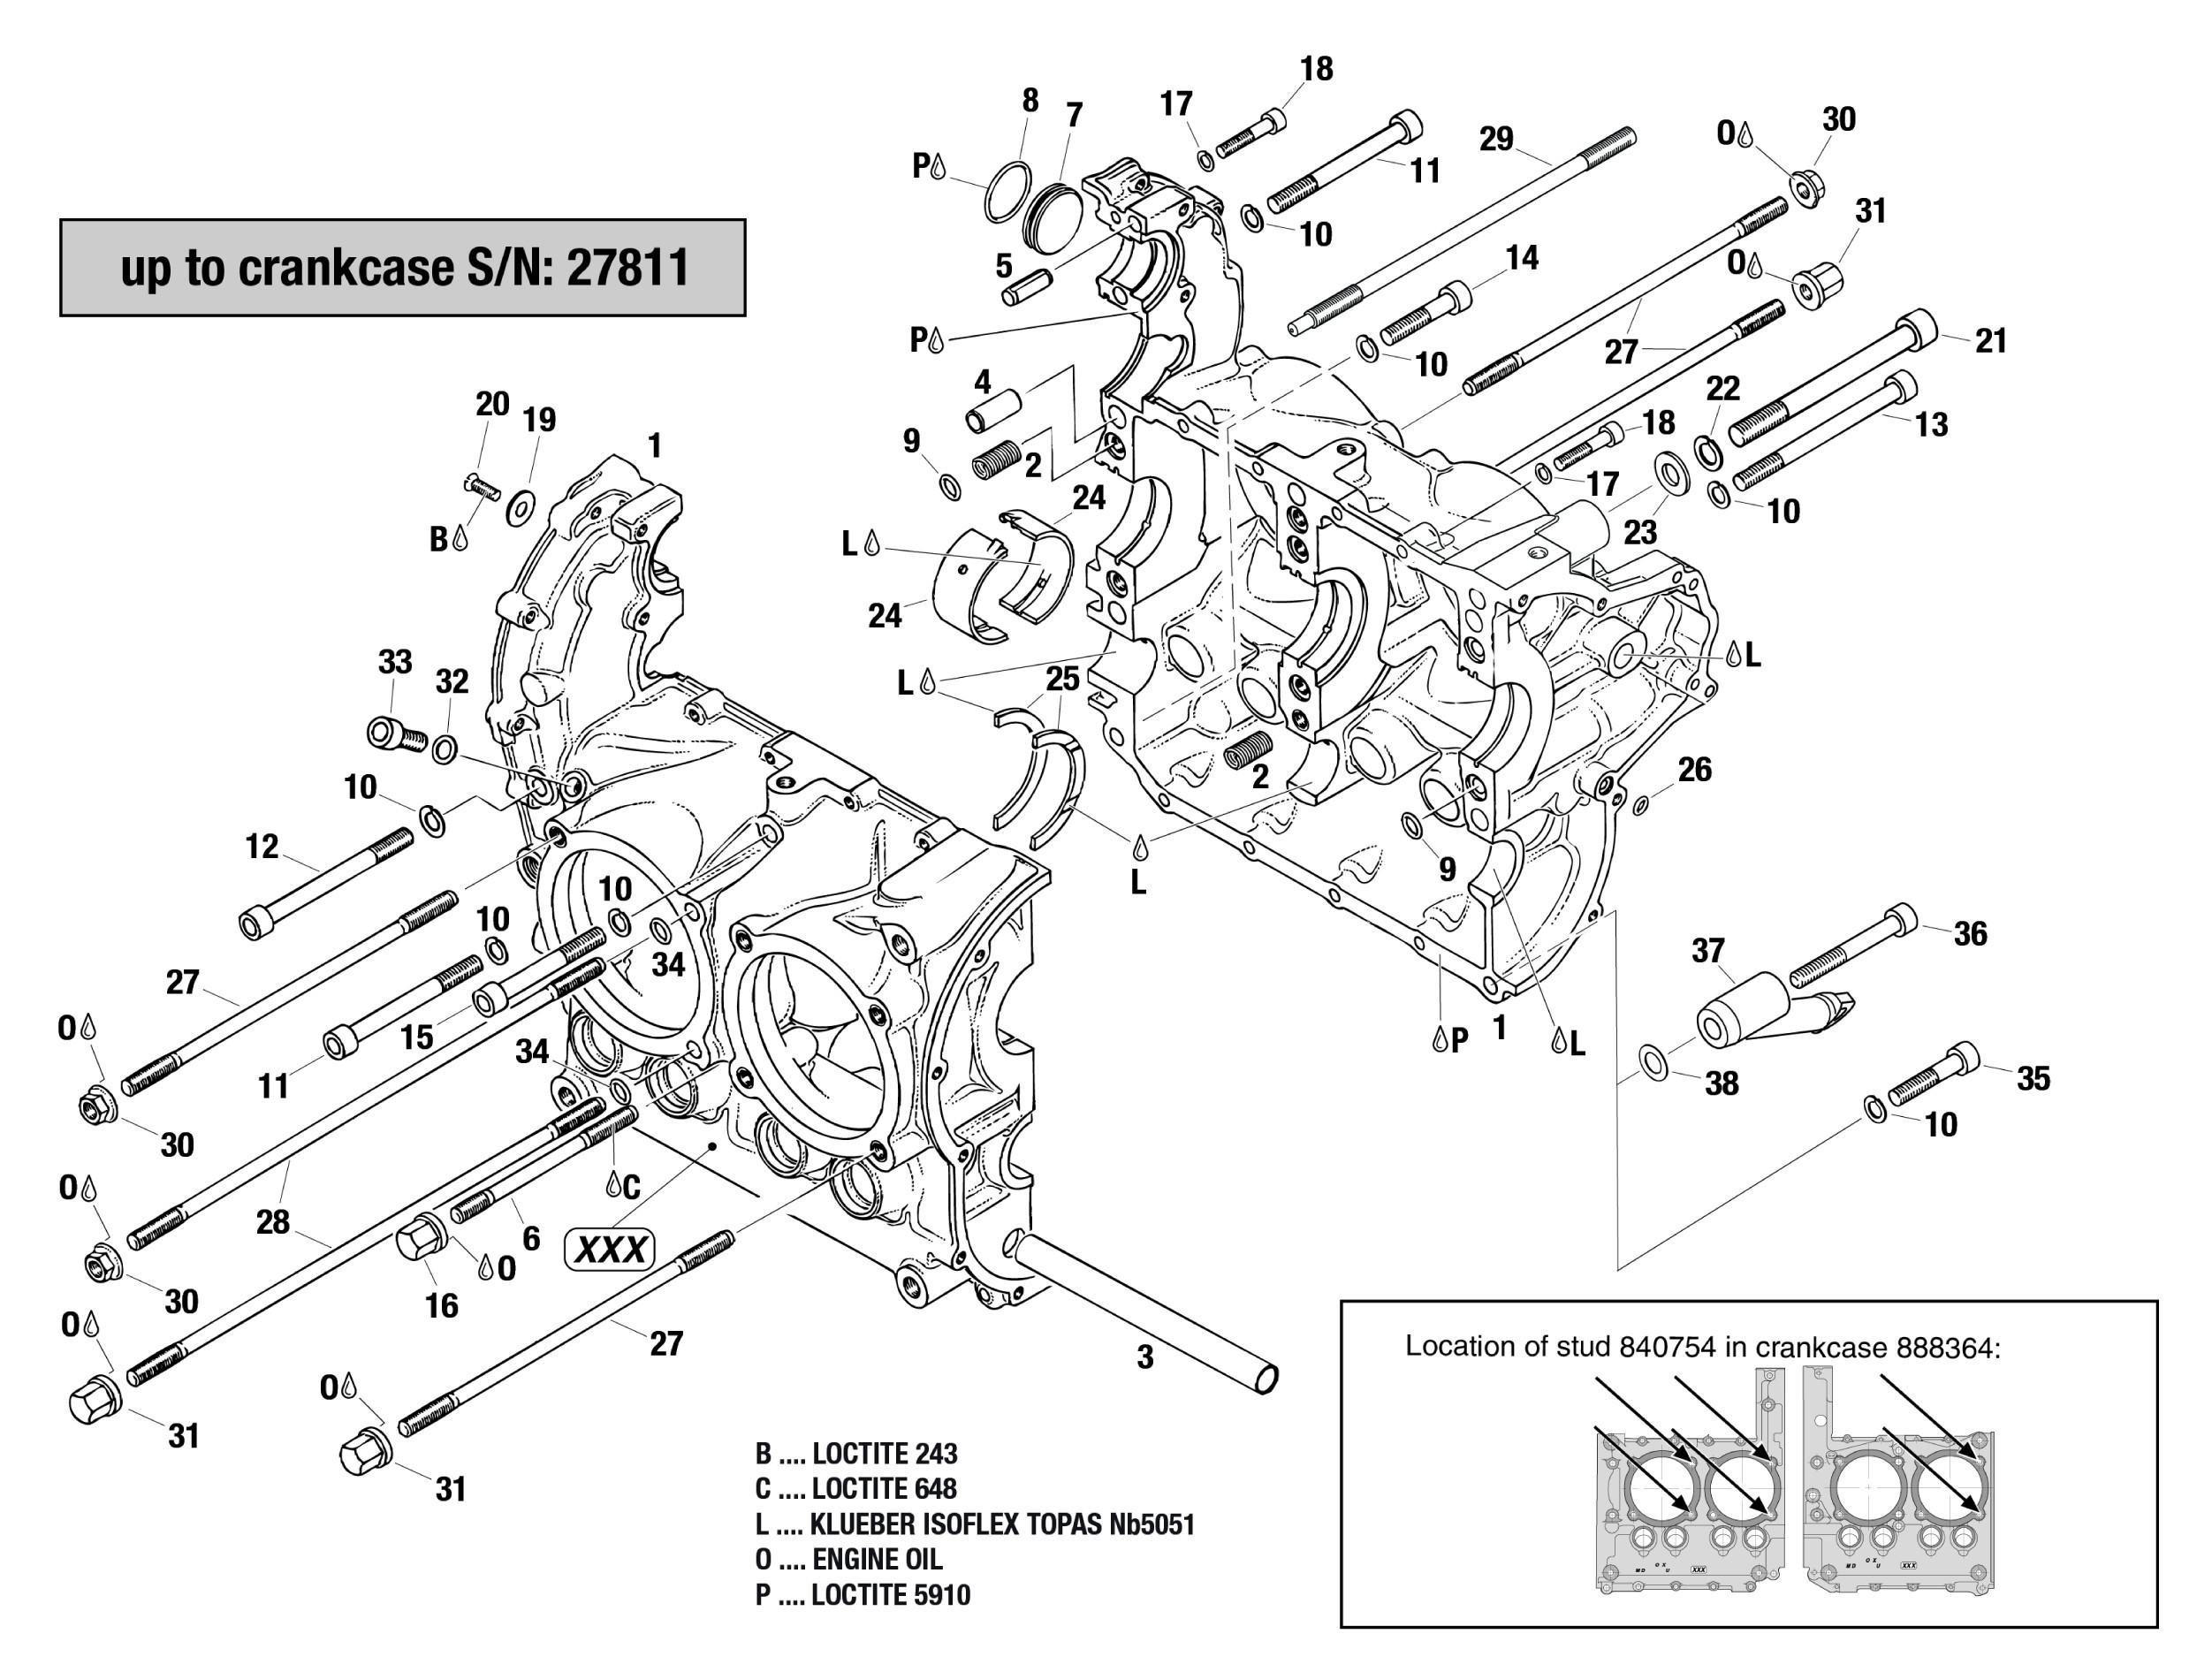 912 Amp 914 Crankcase Up To S N